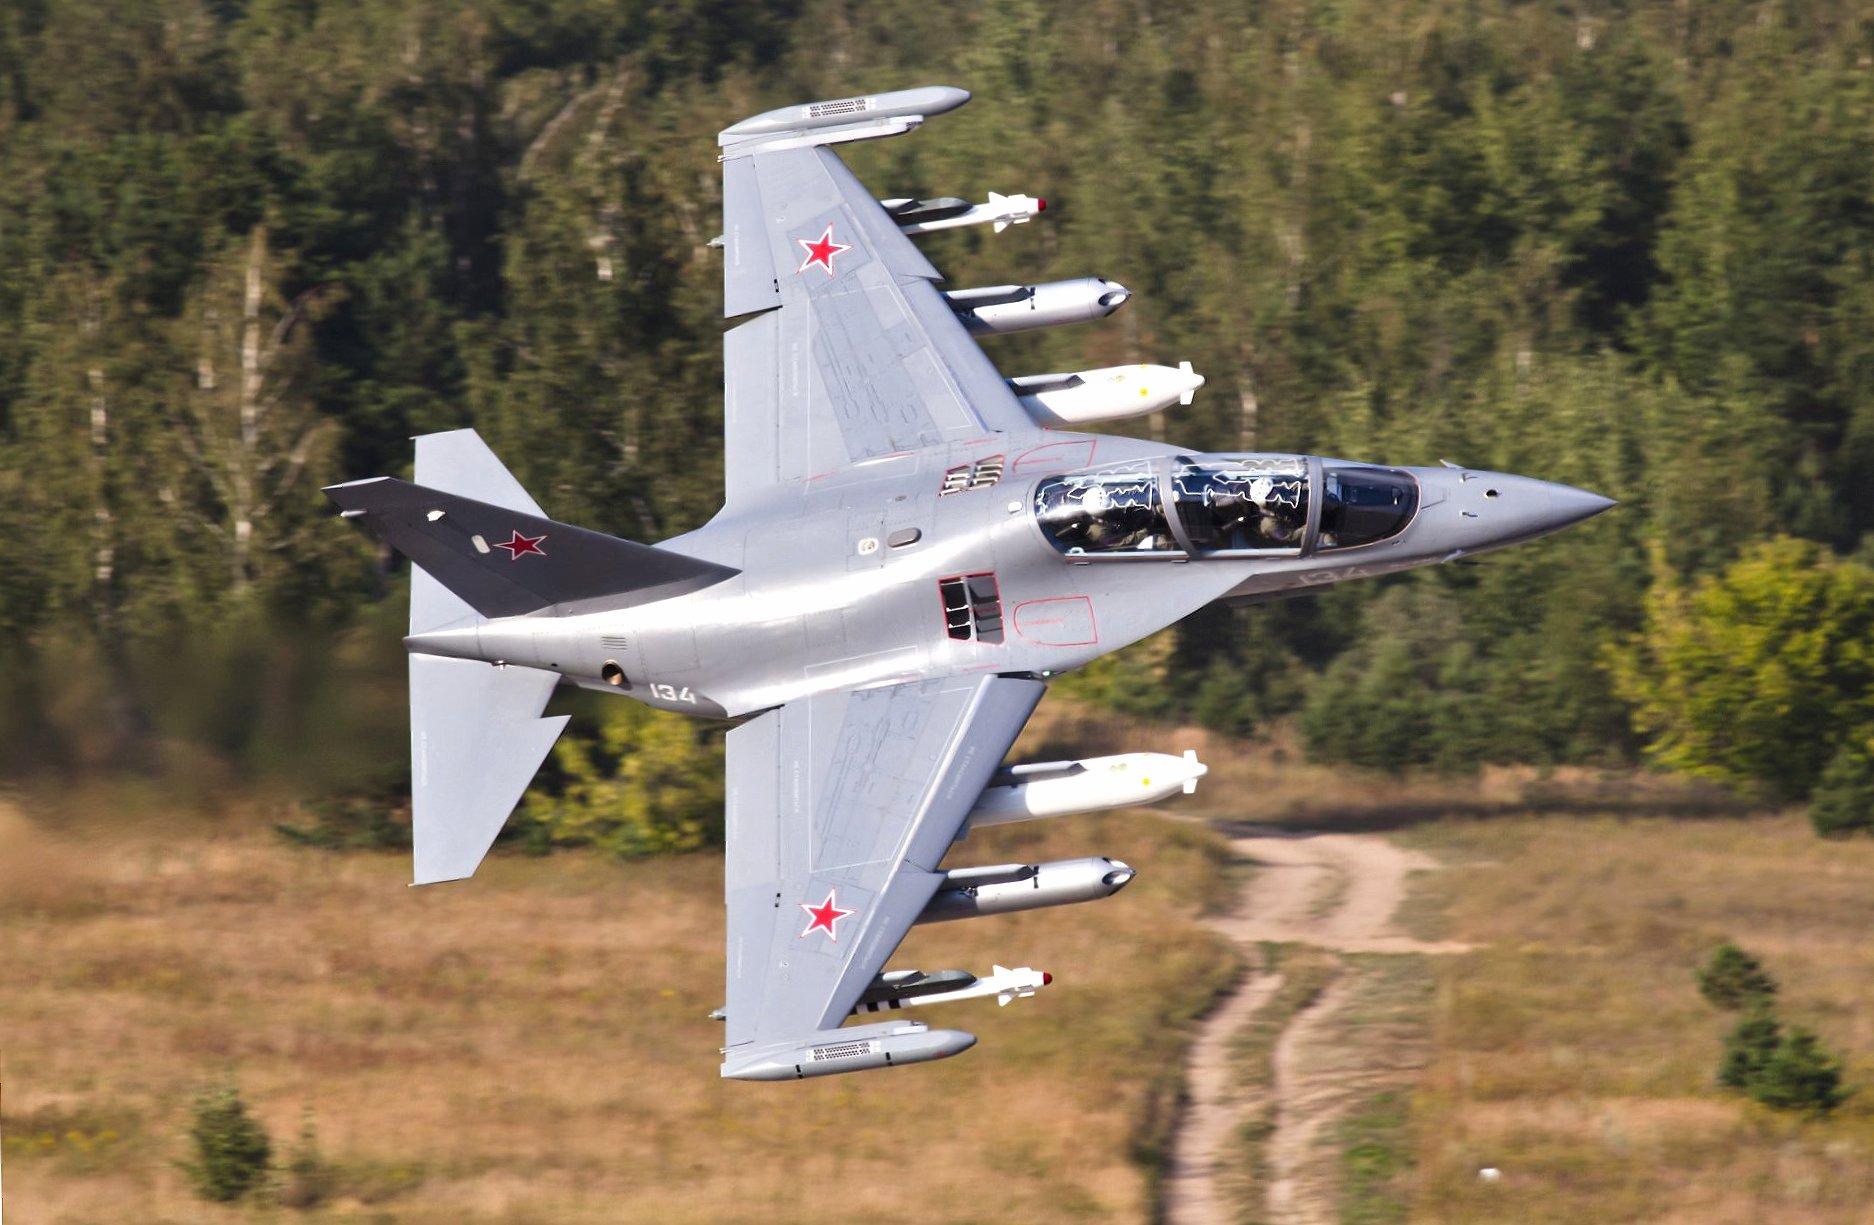 Yakovlev Yak-130 wallpapers HD quality